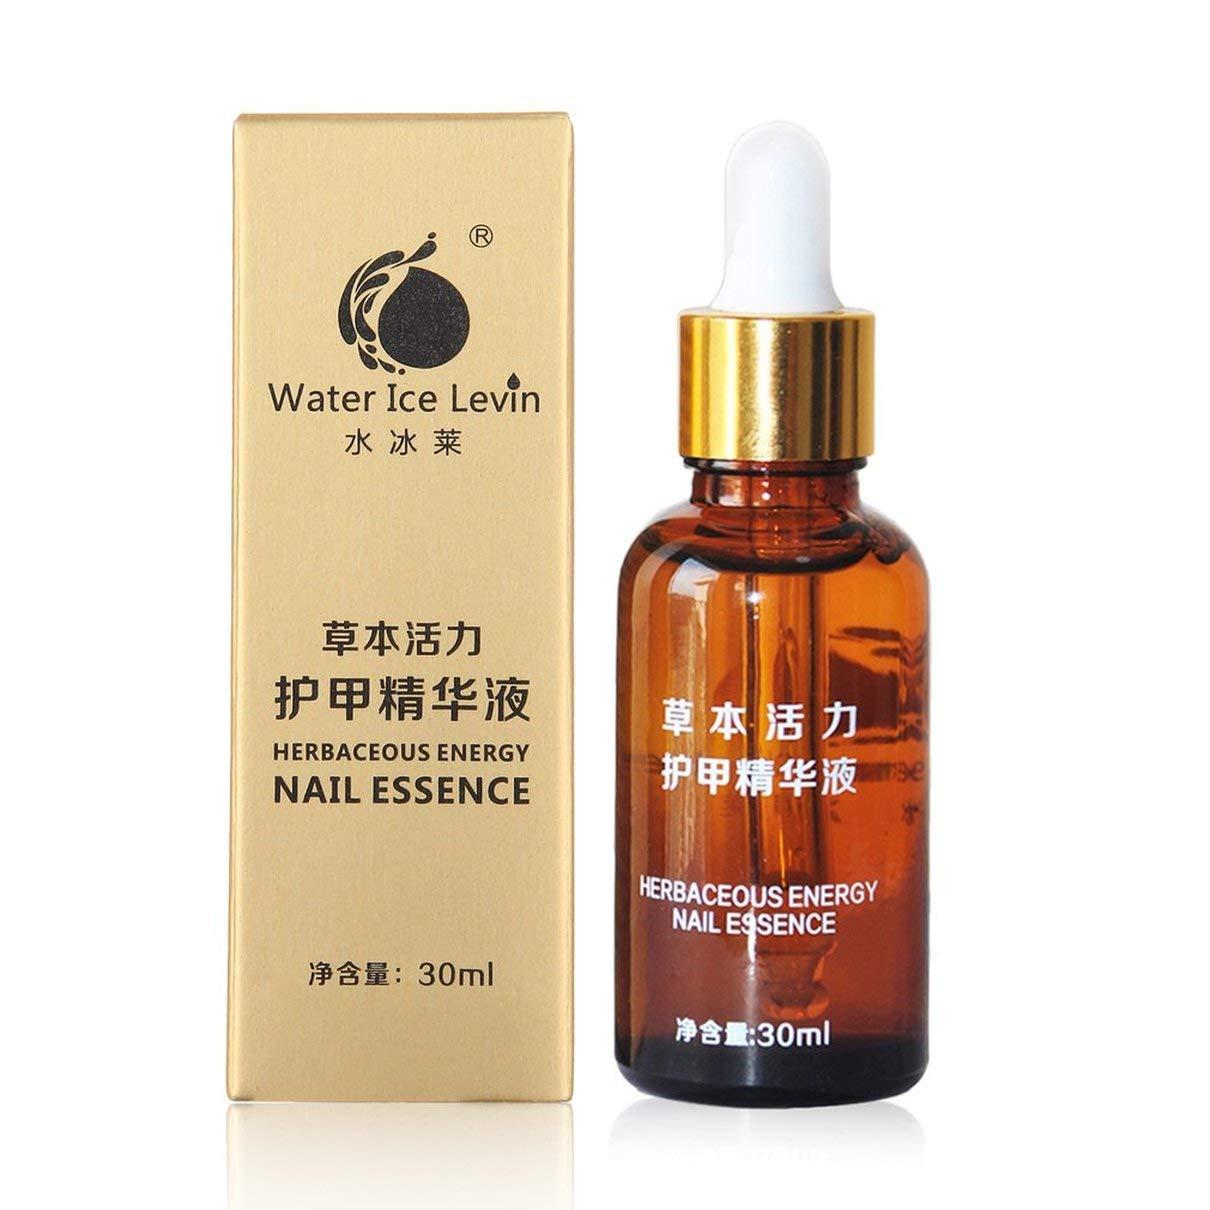 Fungal Nail Treatment Essence Oil Füße Pflege Nagellack Werkzeuge Nagel-Gel-Rüstung Essence Zehennagel Pilz Entfernung 30ml Bellaluee